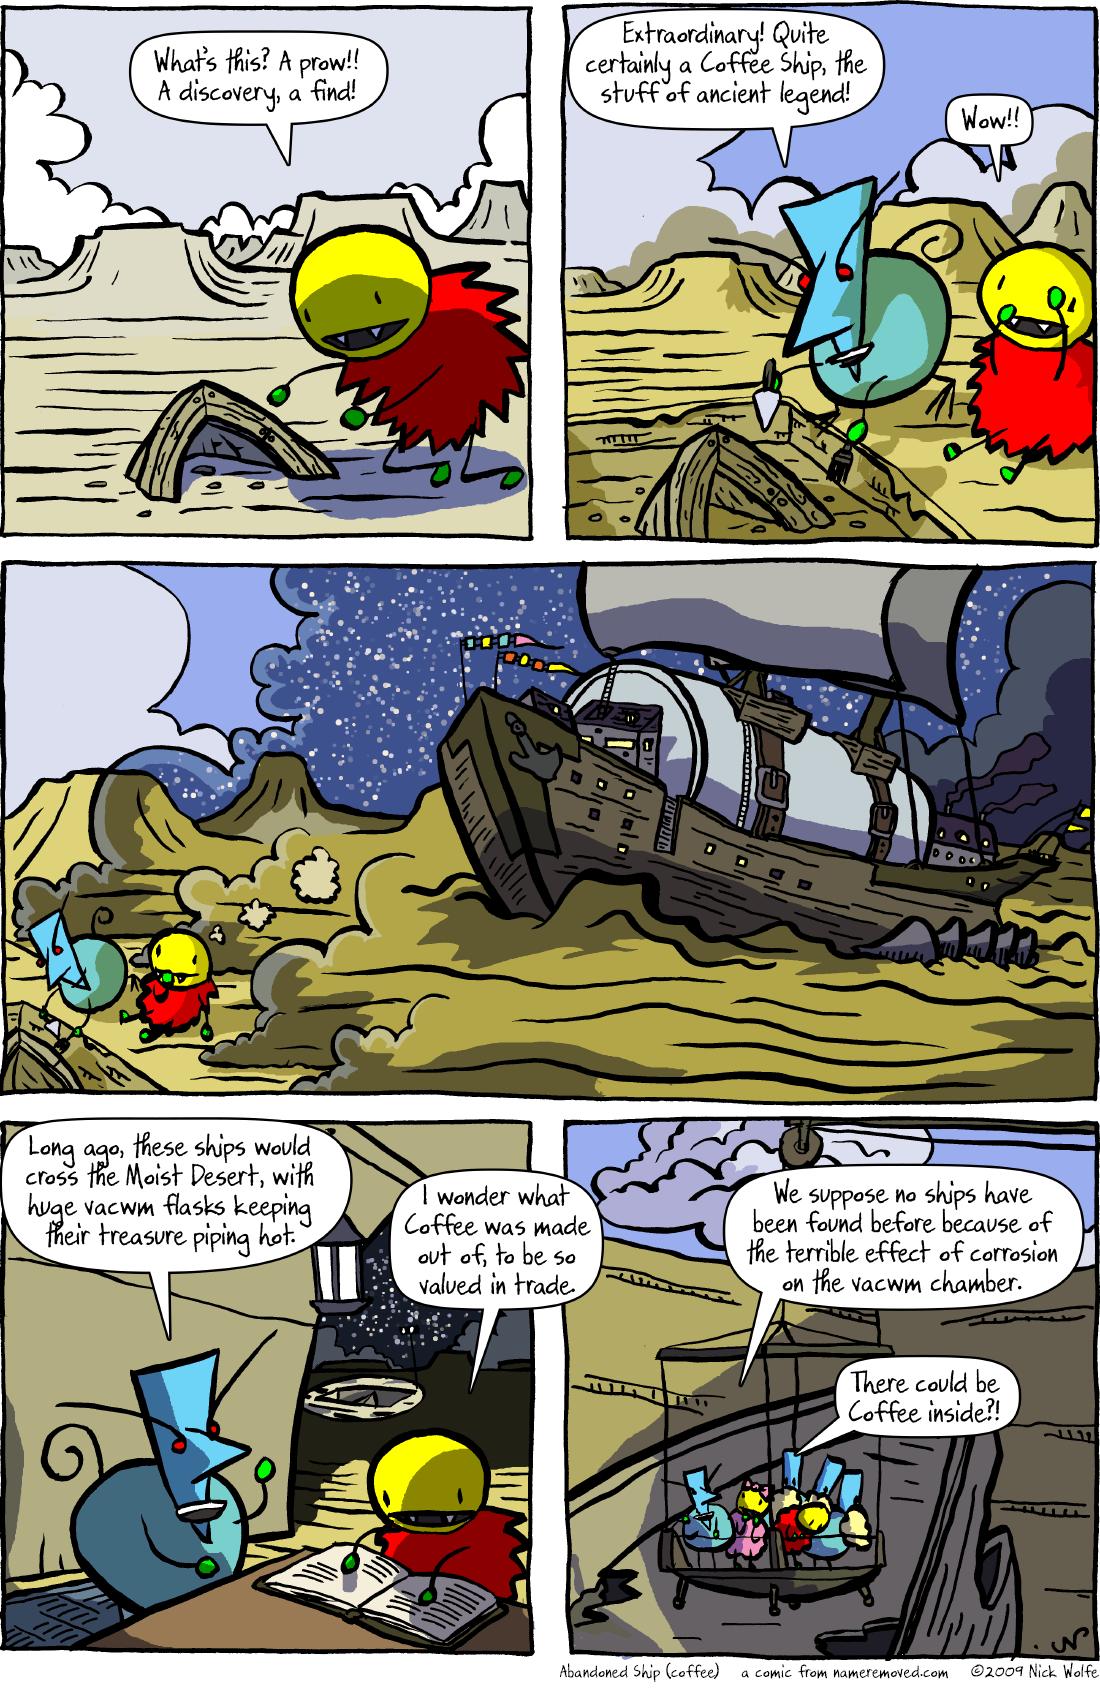 Abandoned Ship (coffee)